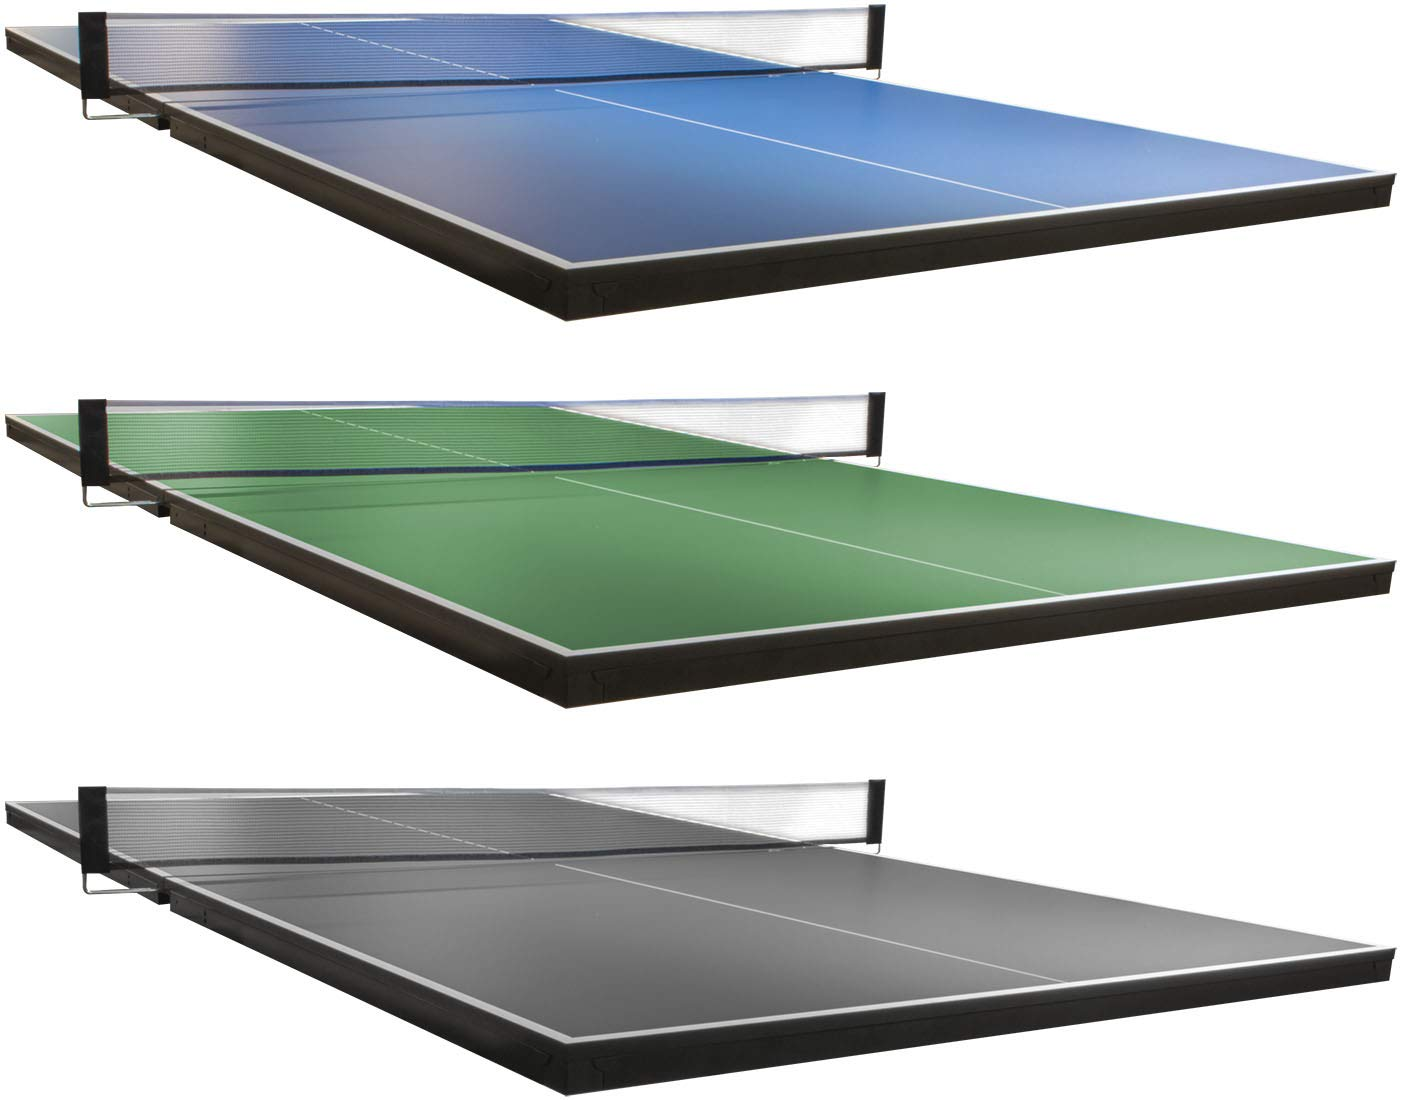 Martin Kilpatrick Ping Pong Table